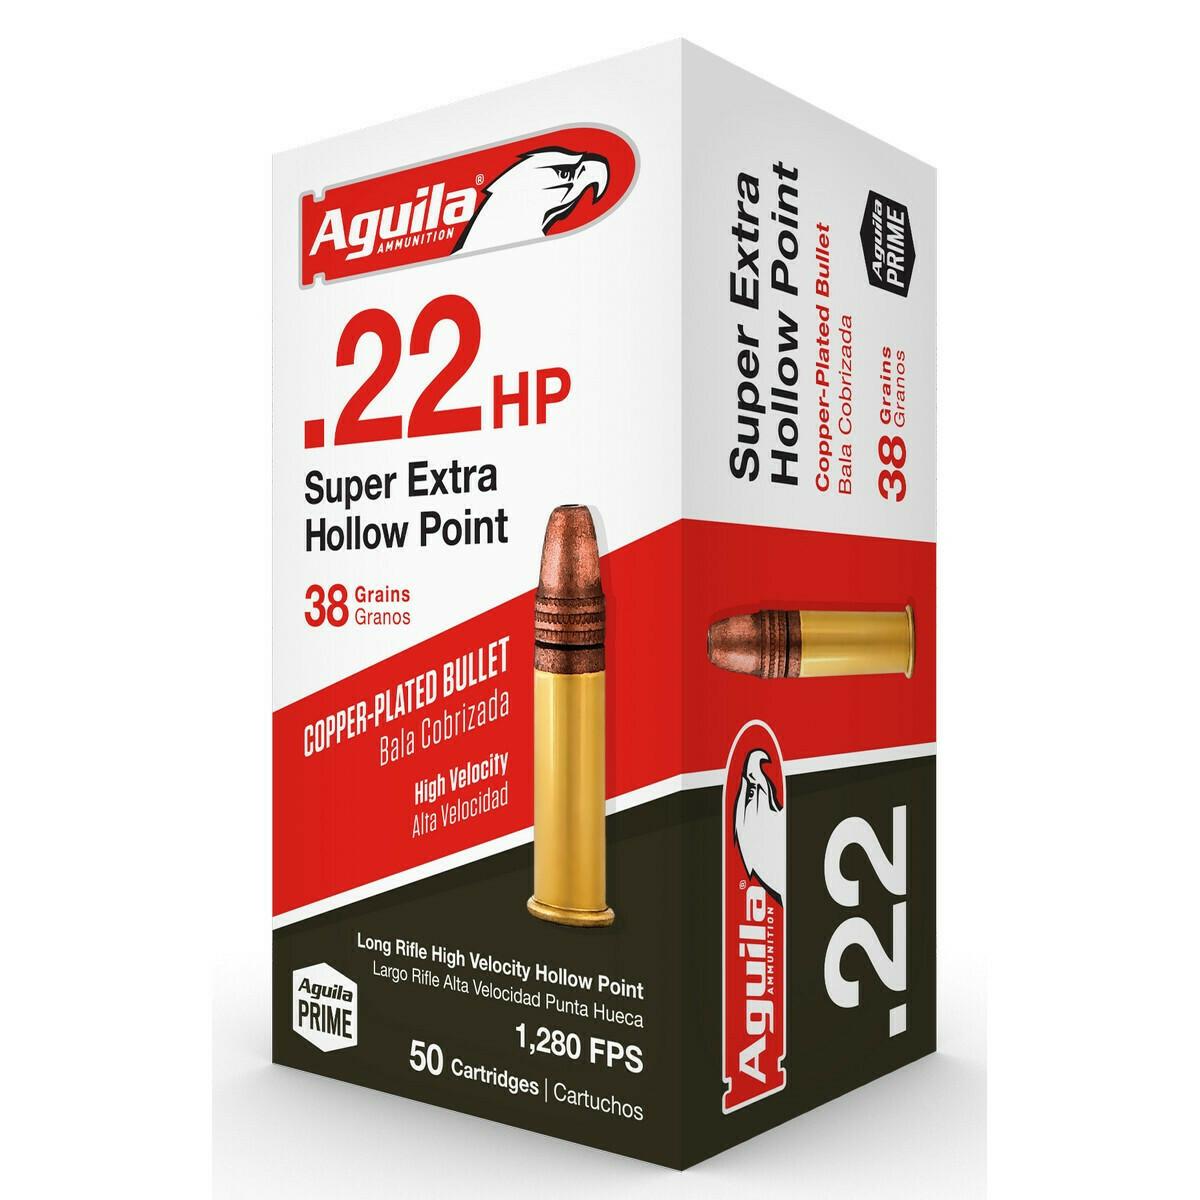 Aguila .22 Hollow Point (38gr) - 2,000rd Case